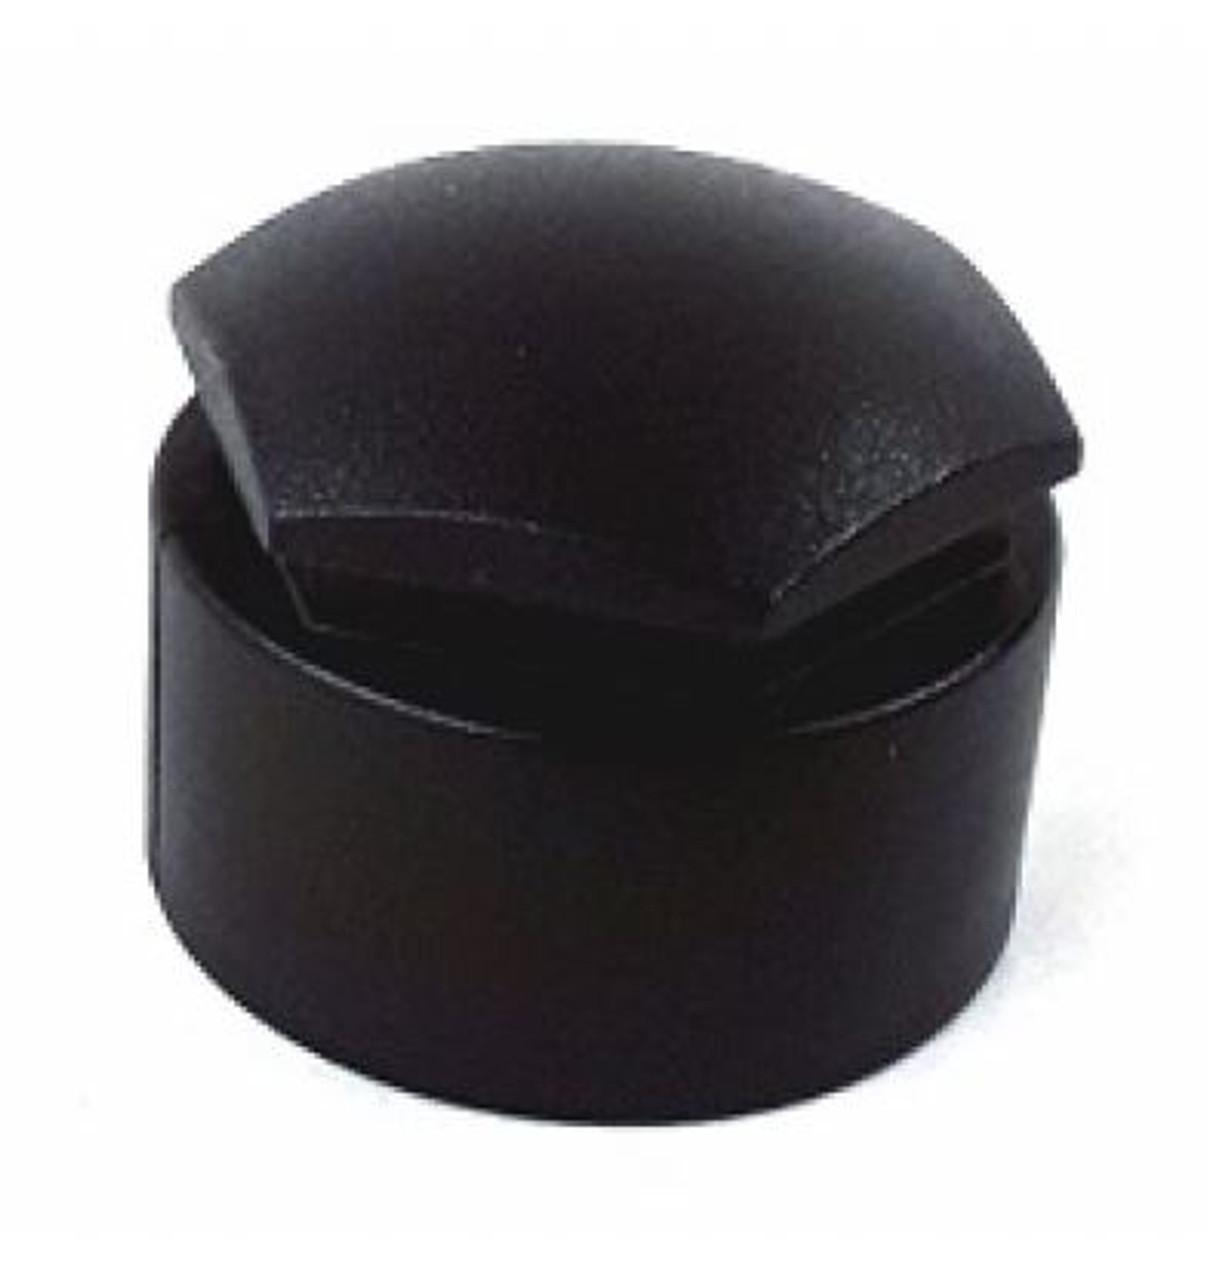 Set of Audi Wheel Bolt Cover Caps For Q7 2007-2015 BLACK